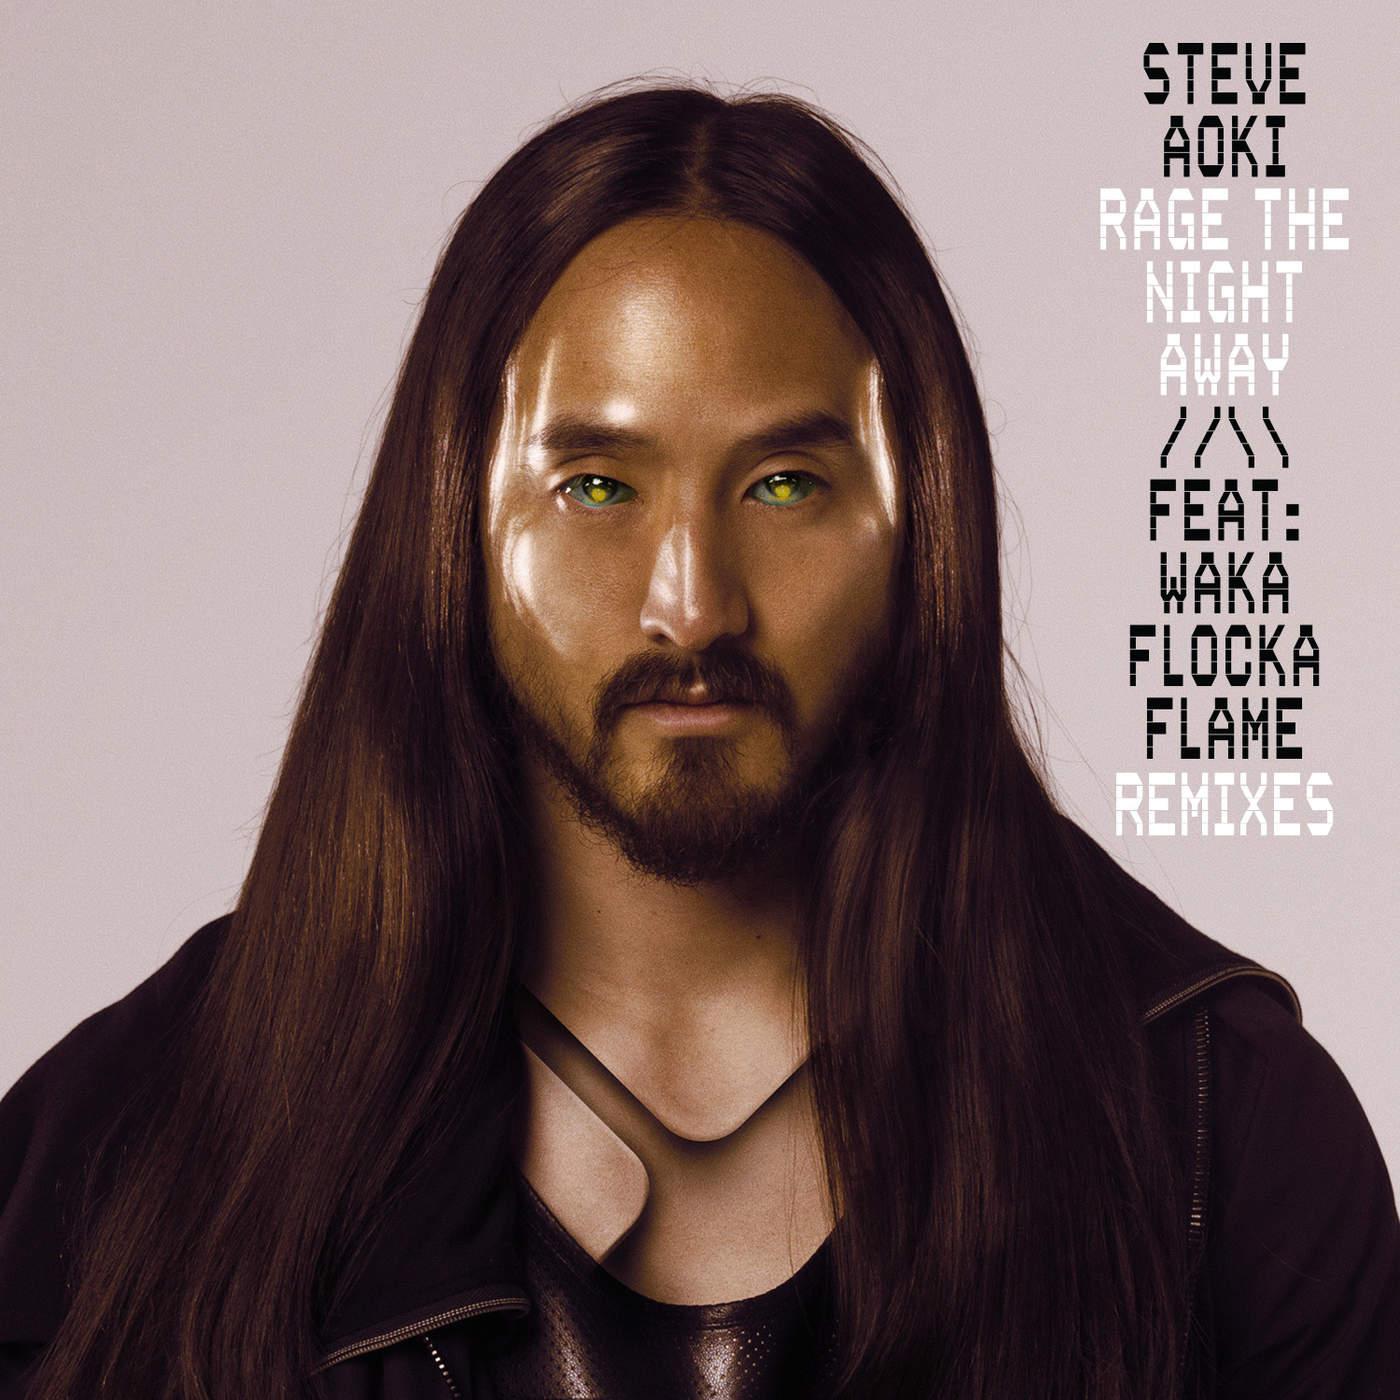 Steve Aoki - Rage the Night Away (feat. Waka Flocka Flame) [Remixes] - EP Cover